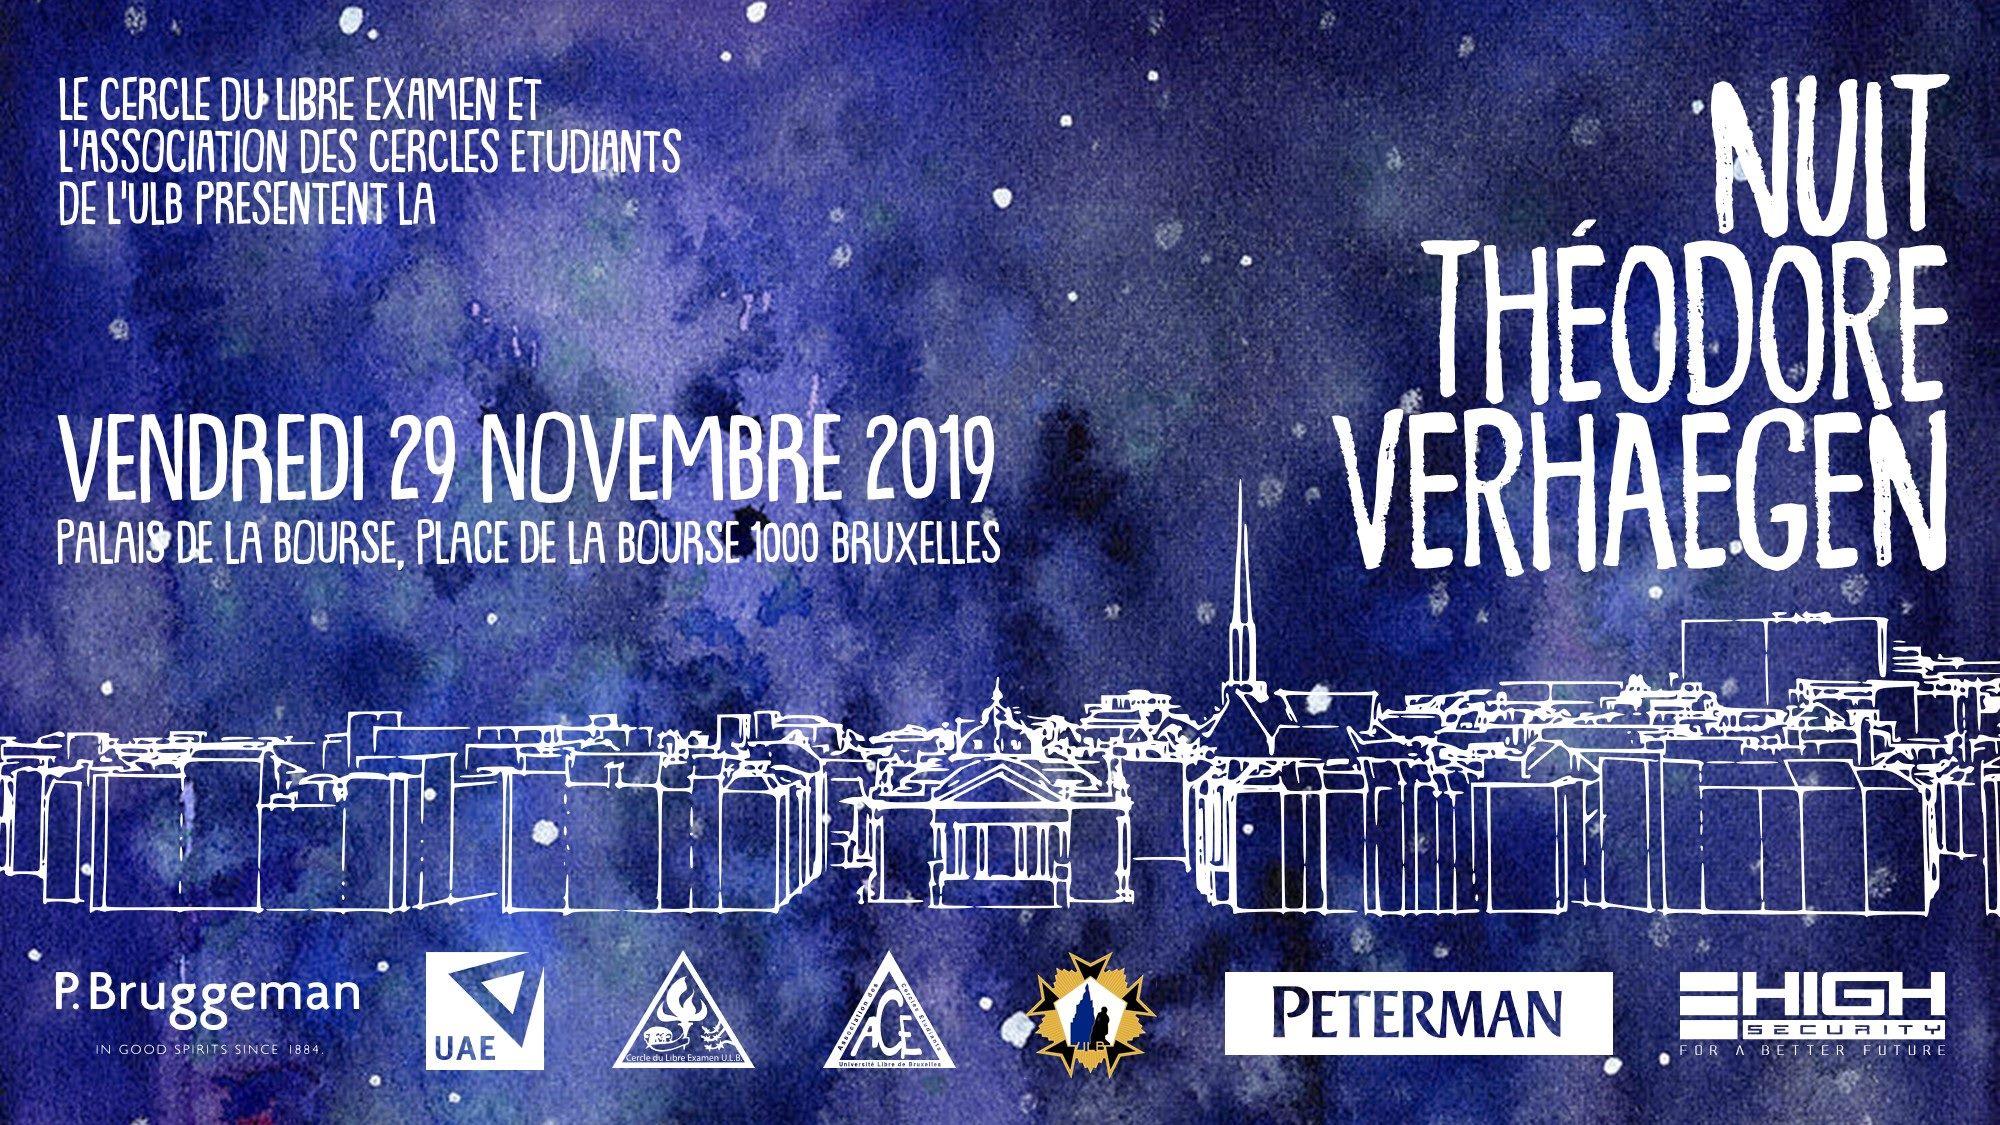 Nuit Théodore Verhaegen 2019